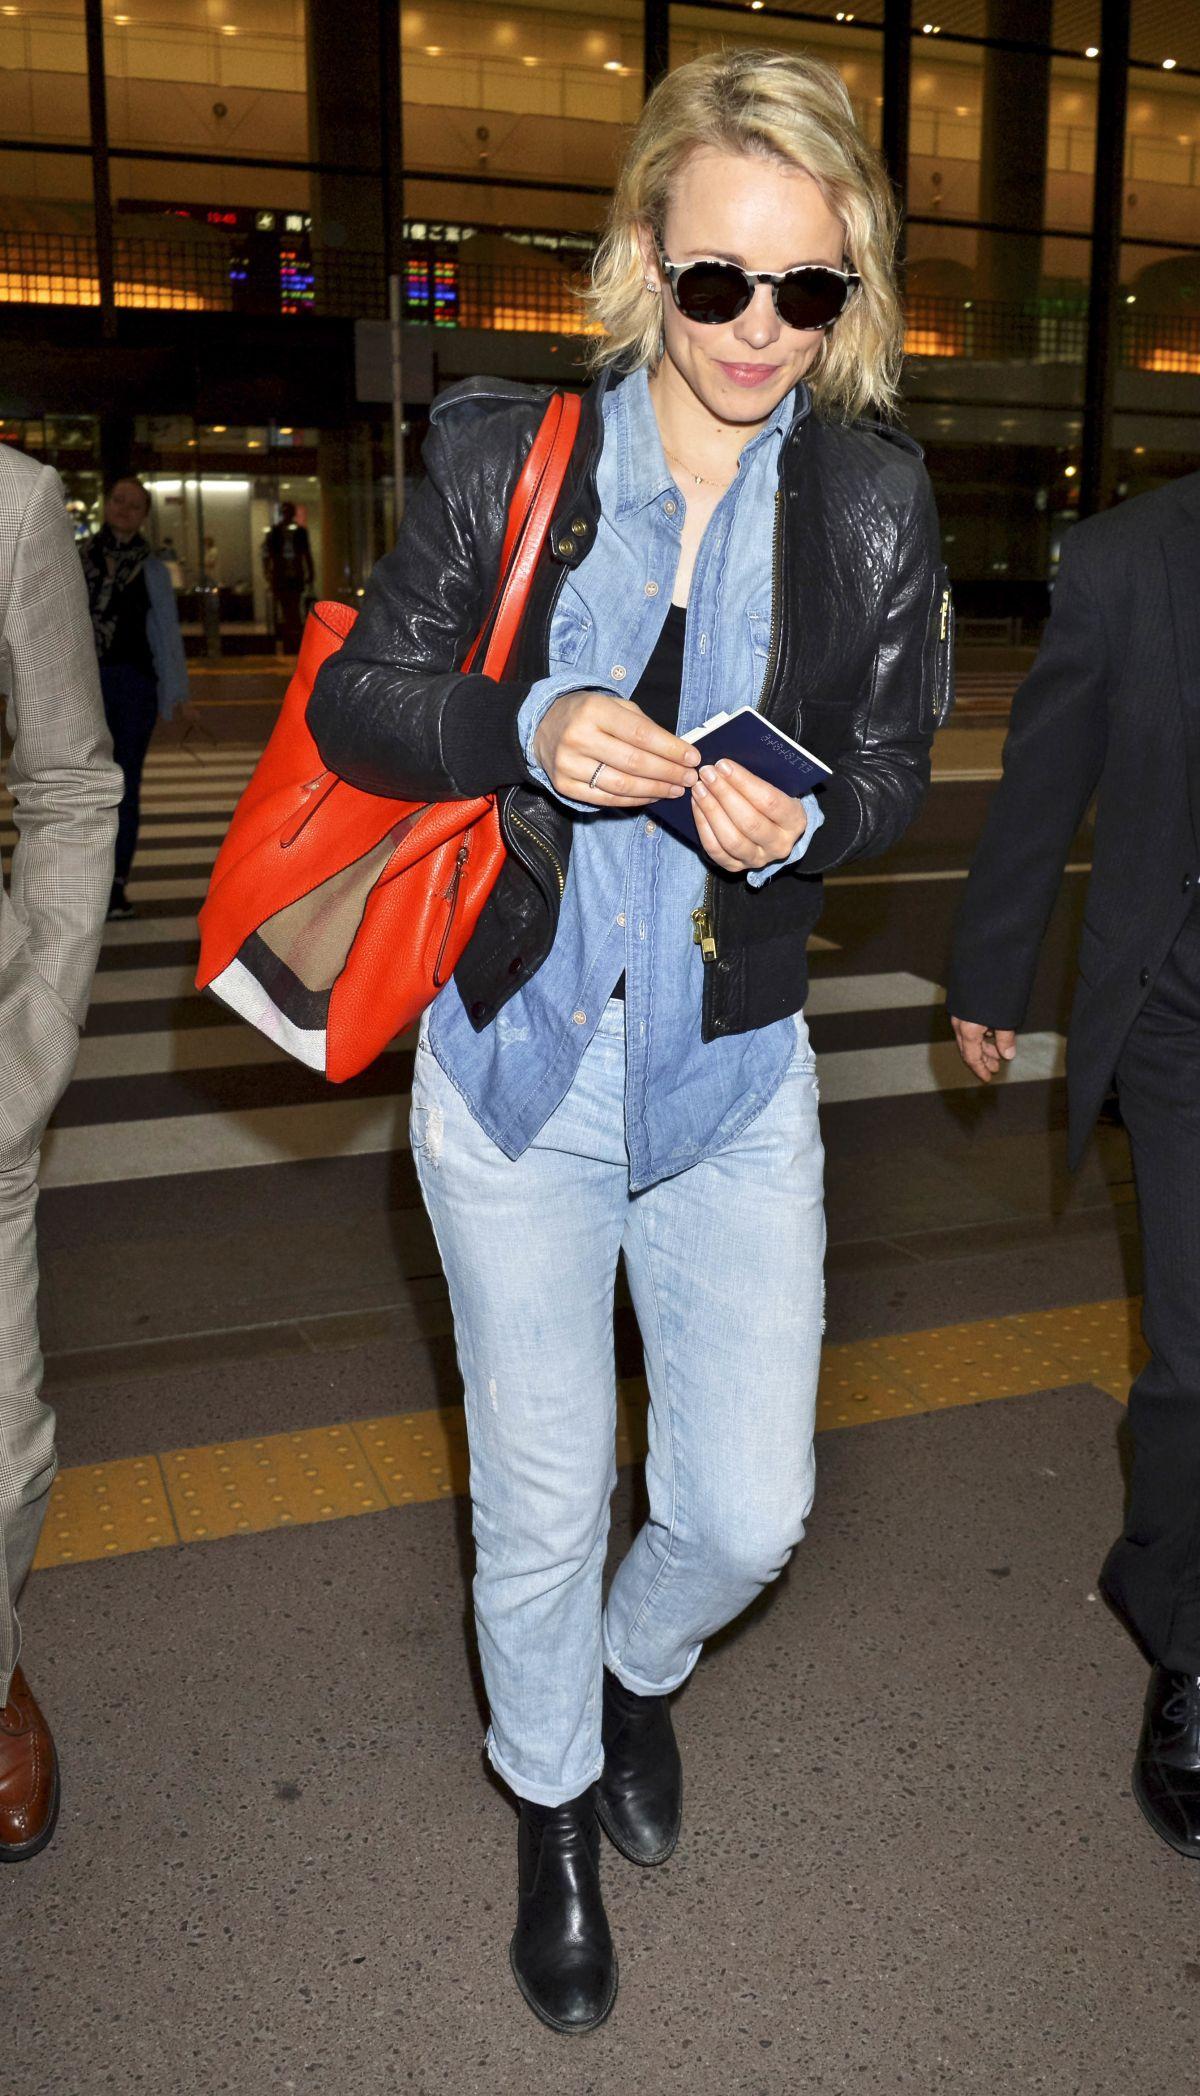 RACHEL MCADAMS at Narita International Airport in Tokyo 04/13/2016